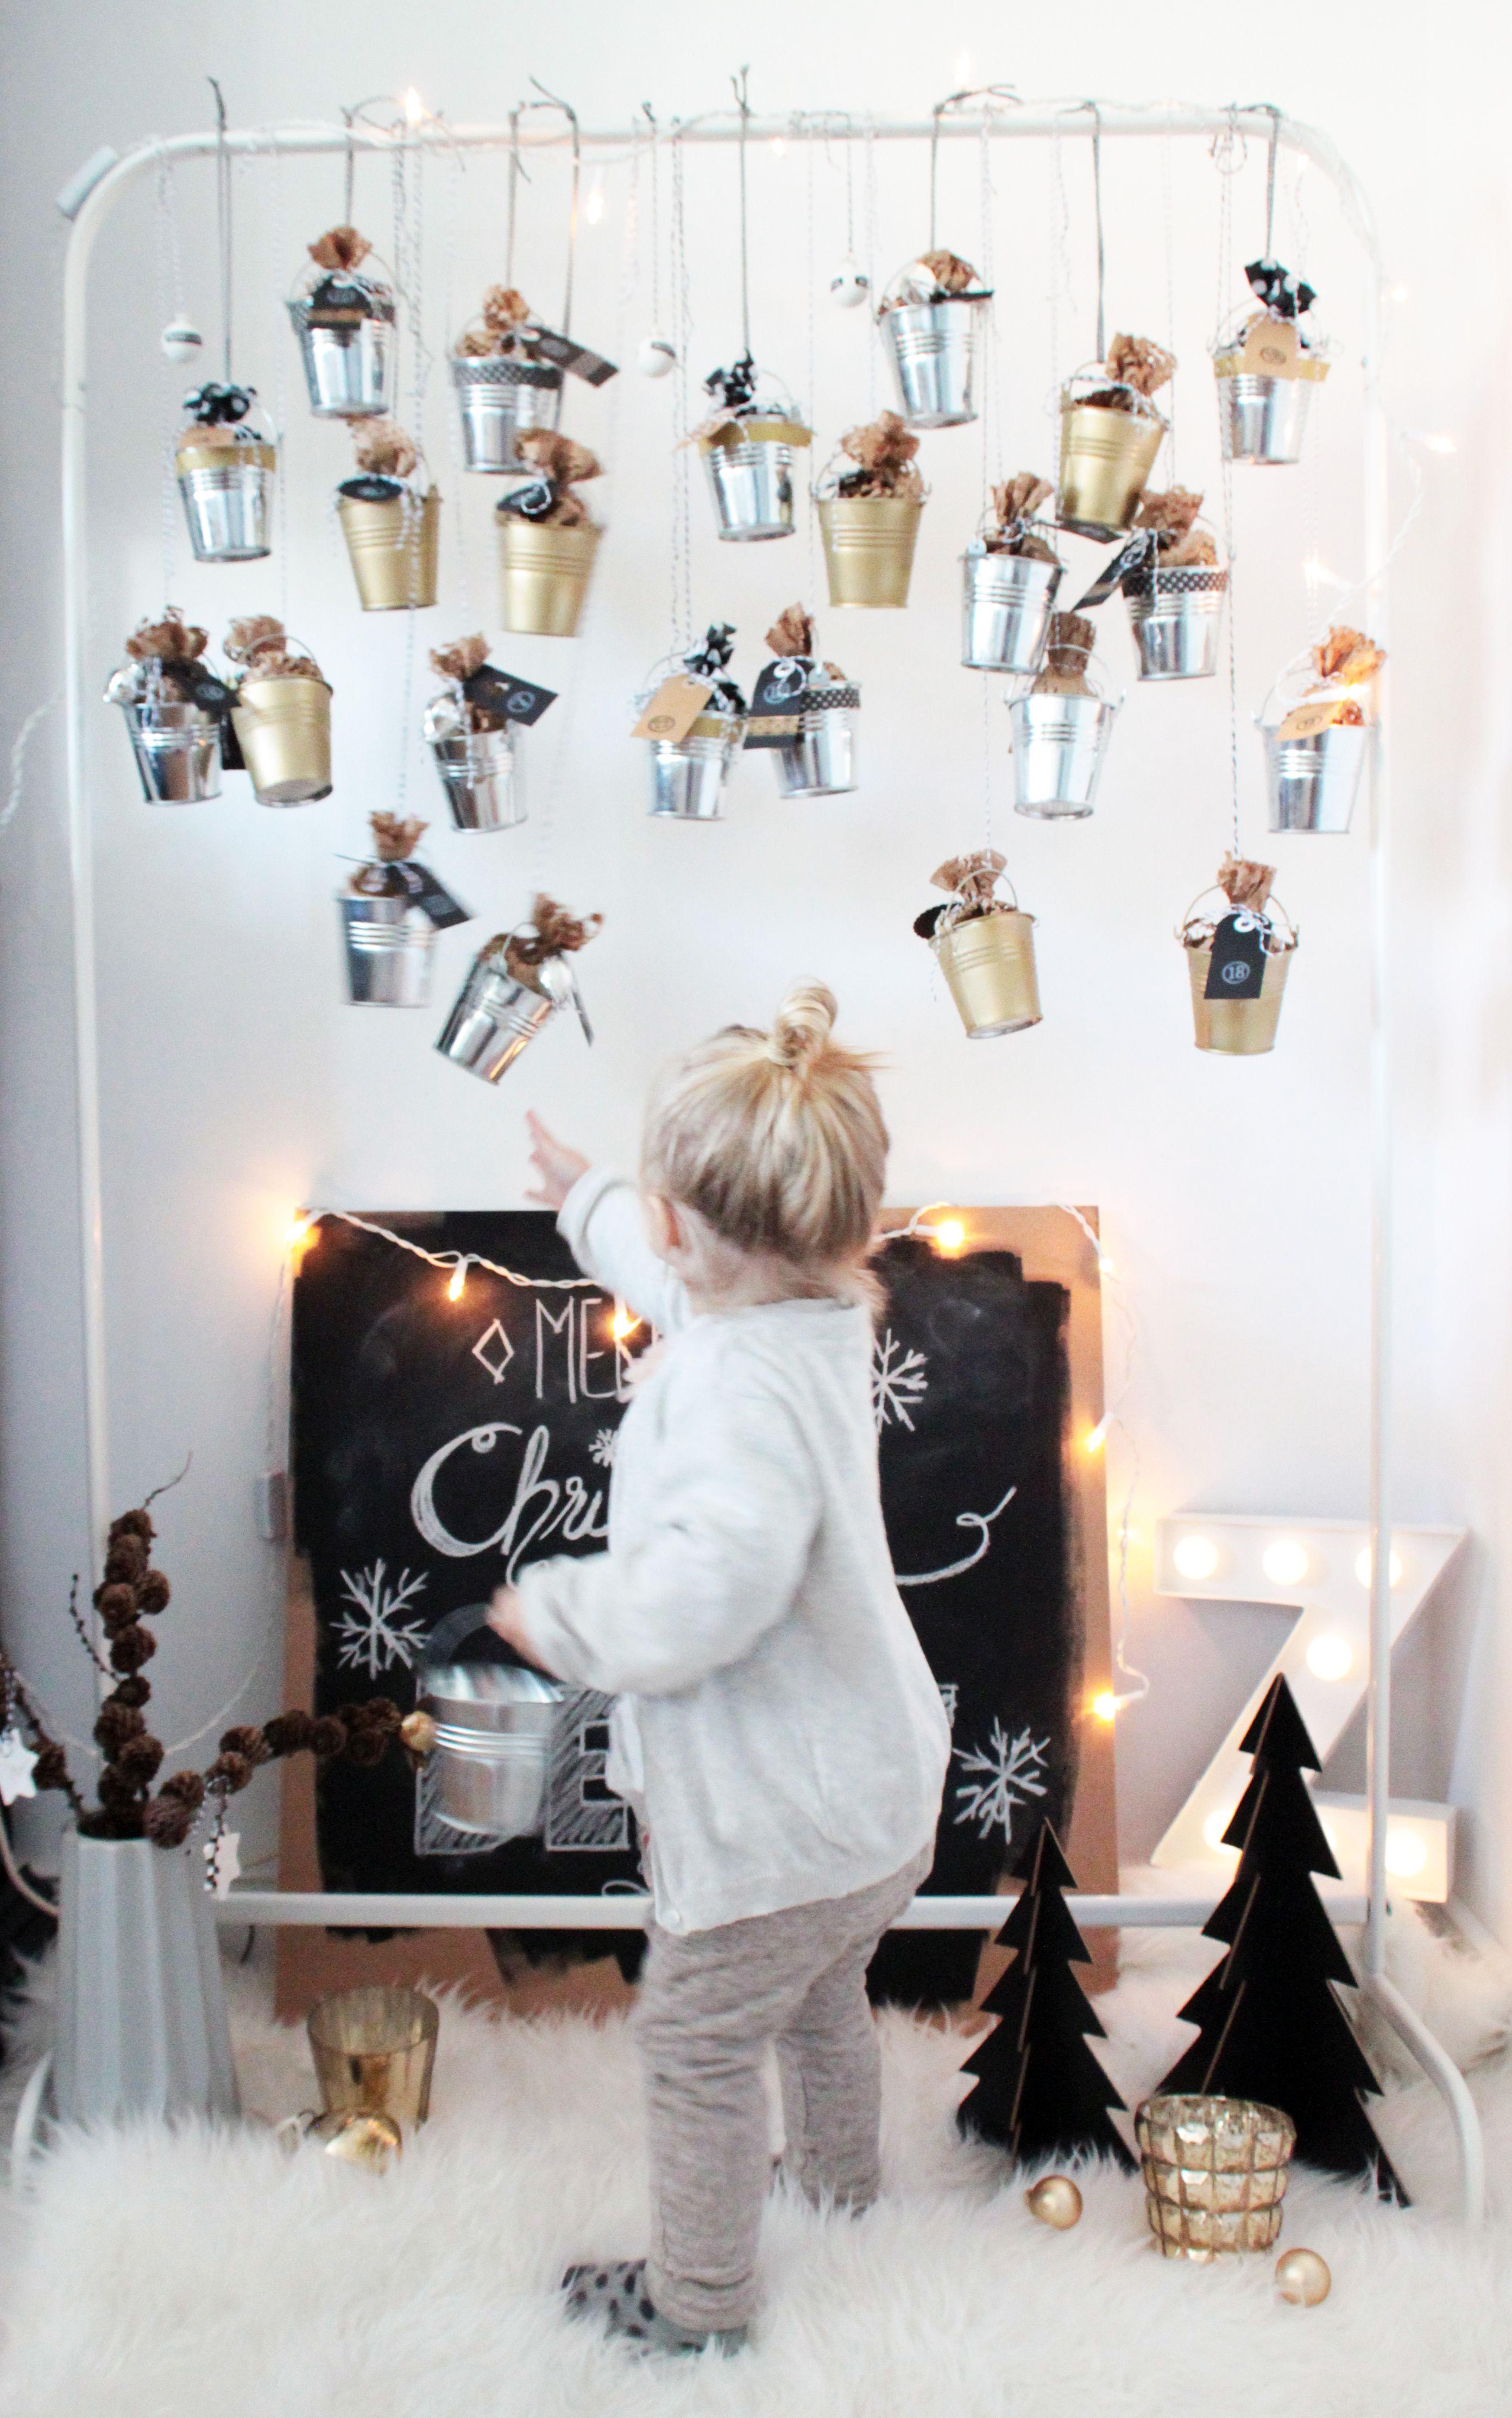 Ein Ruck Zuck Diy #Adventskalender Aus Kleinen Blecheimerchen #Diy #Kidsadventcalendar Advent